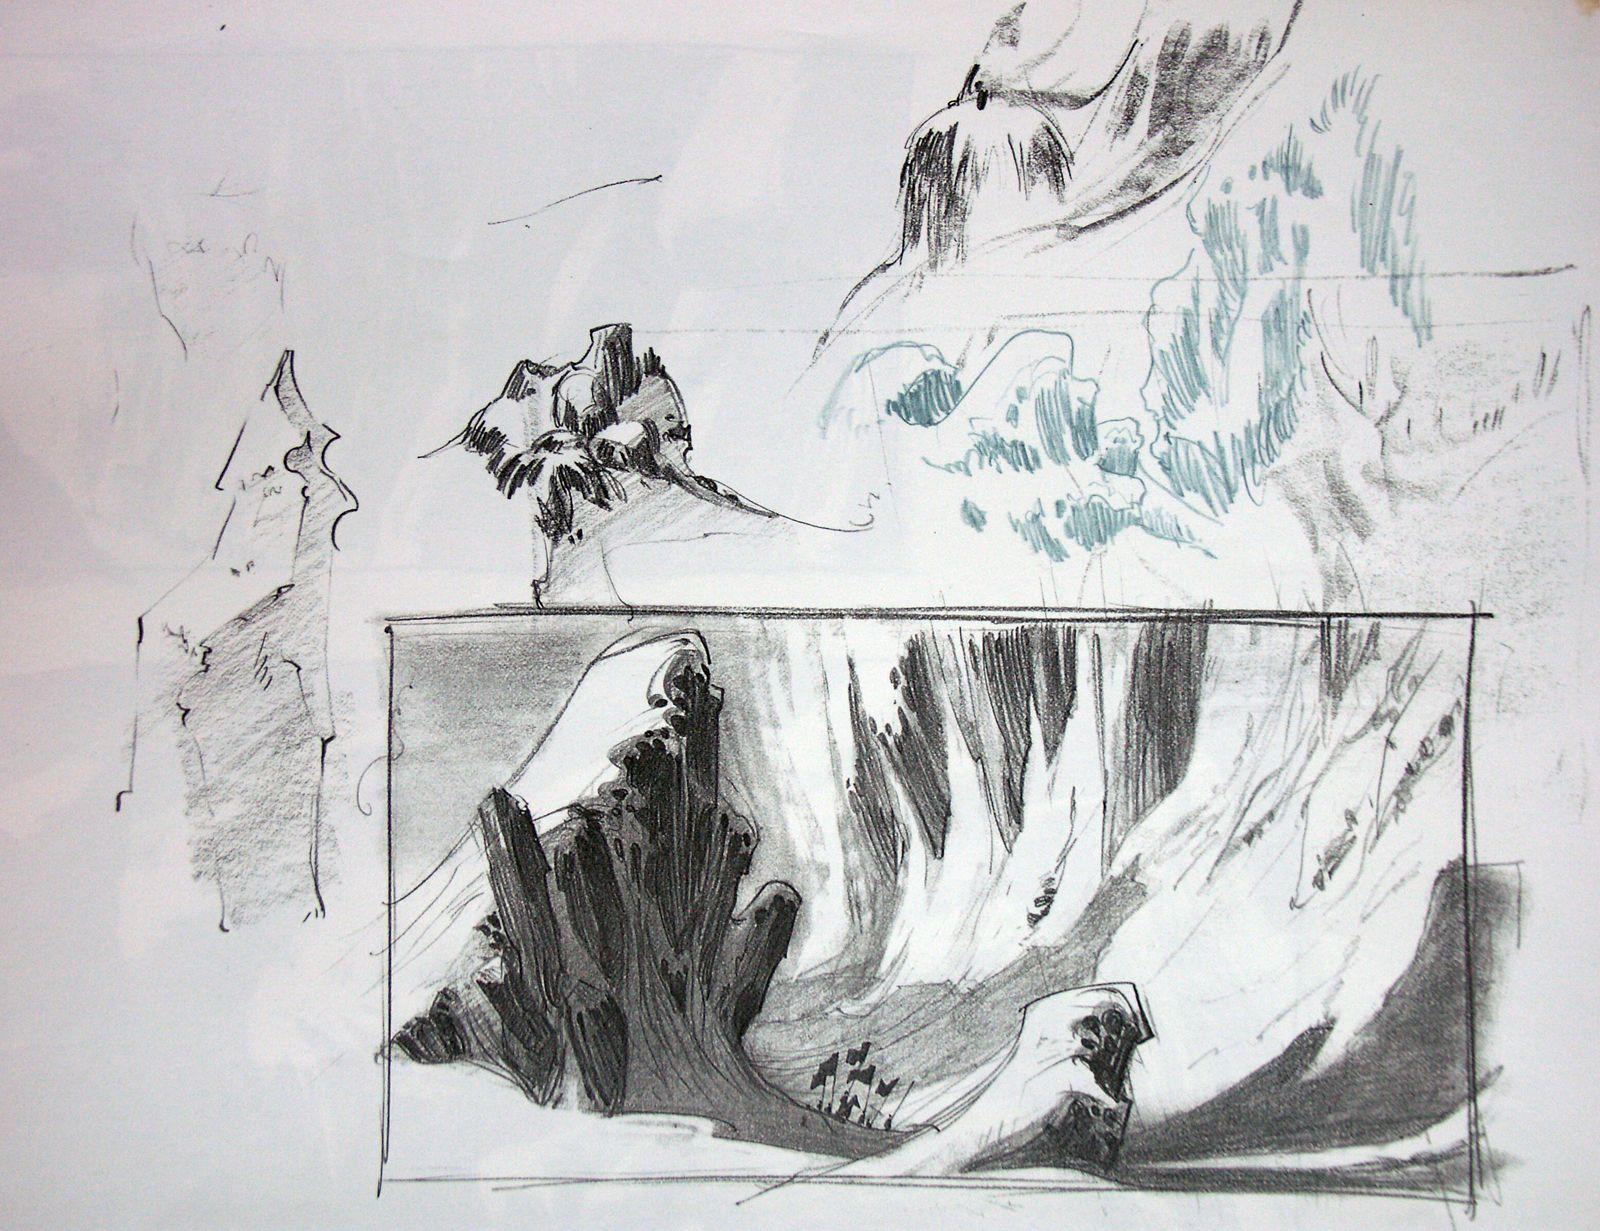 paul lasaine concept art - Google-søgning